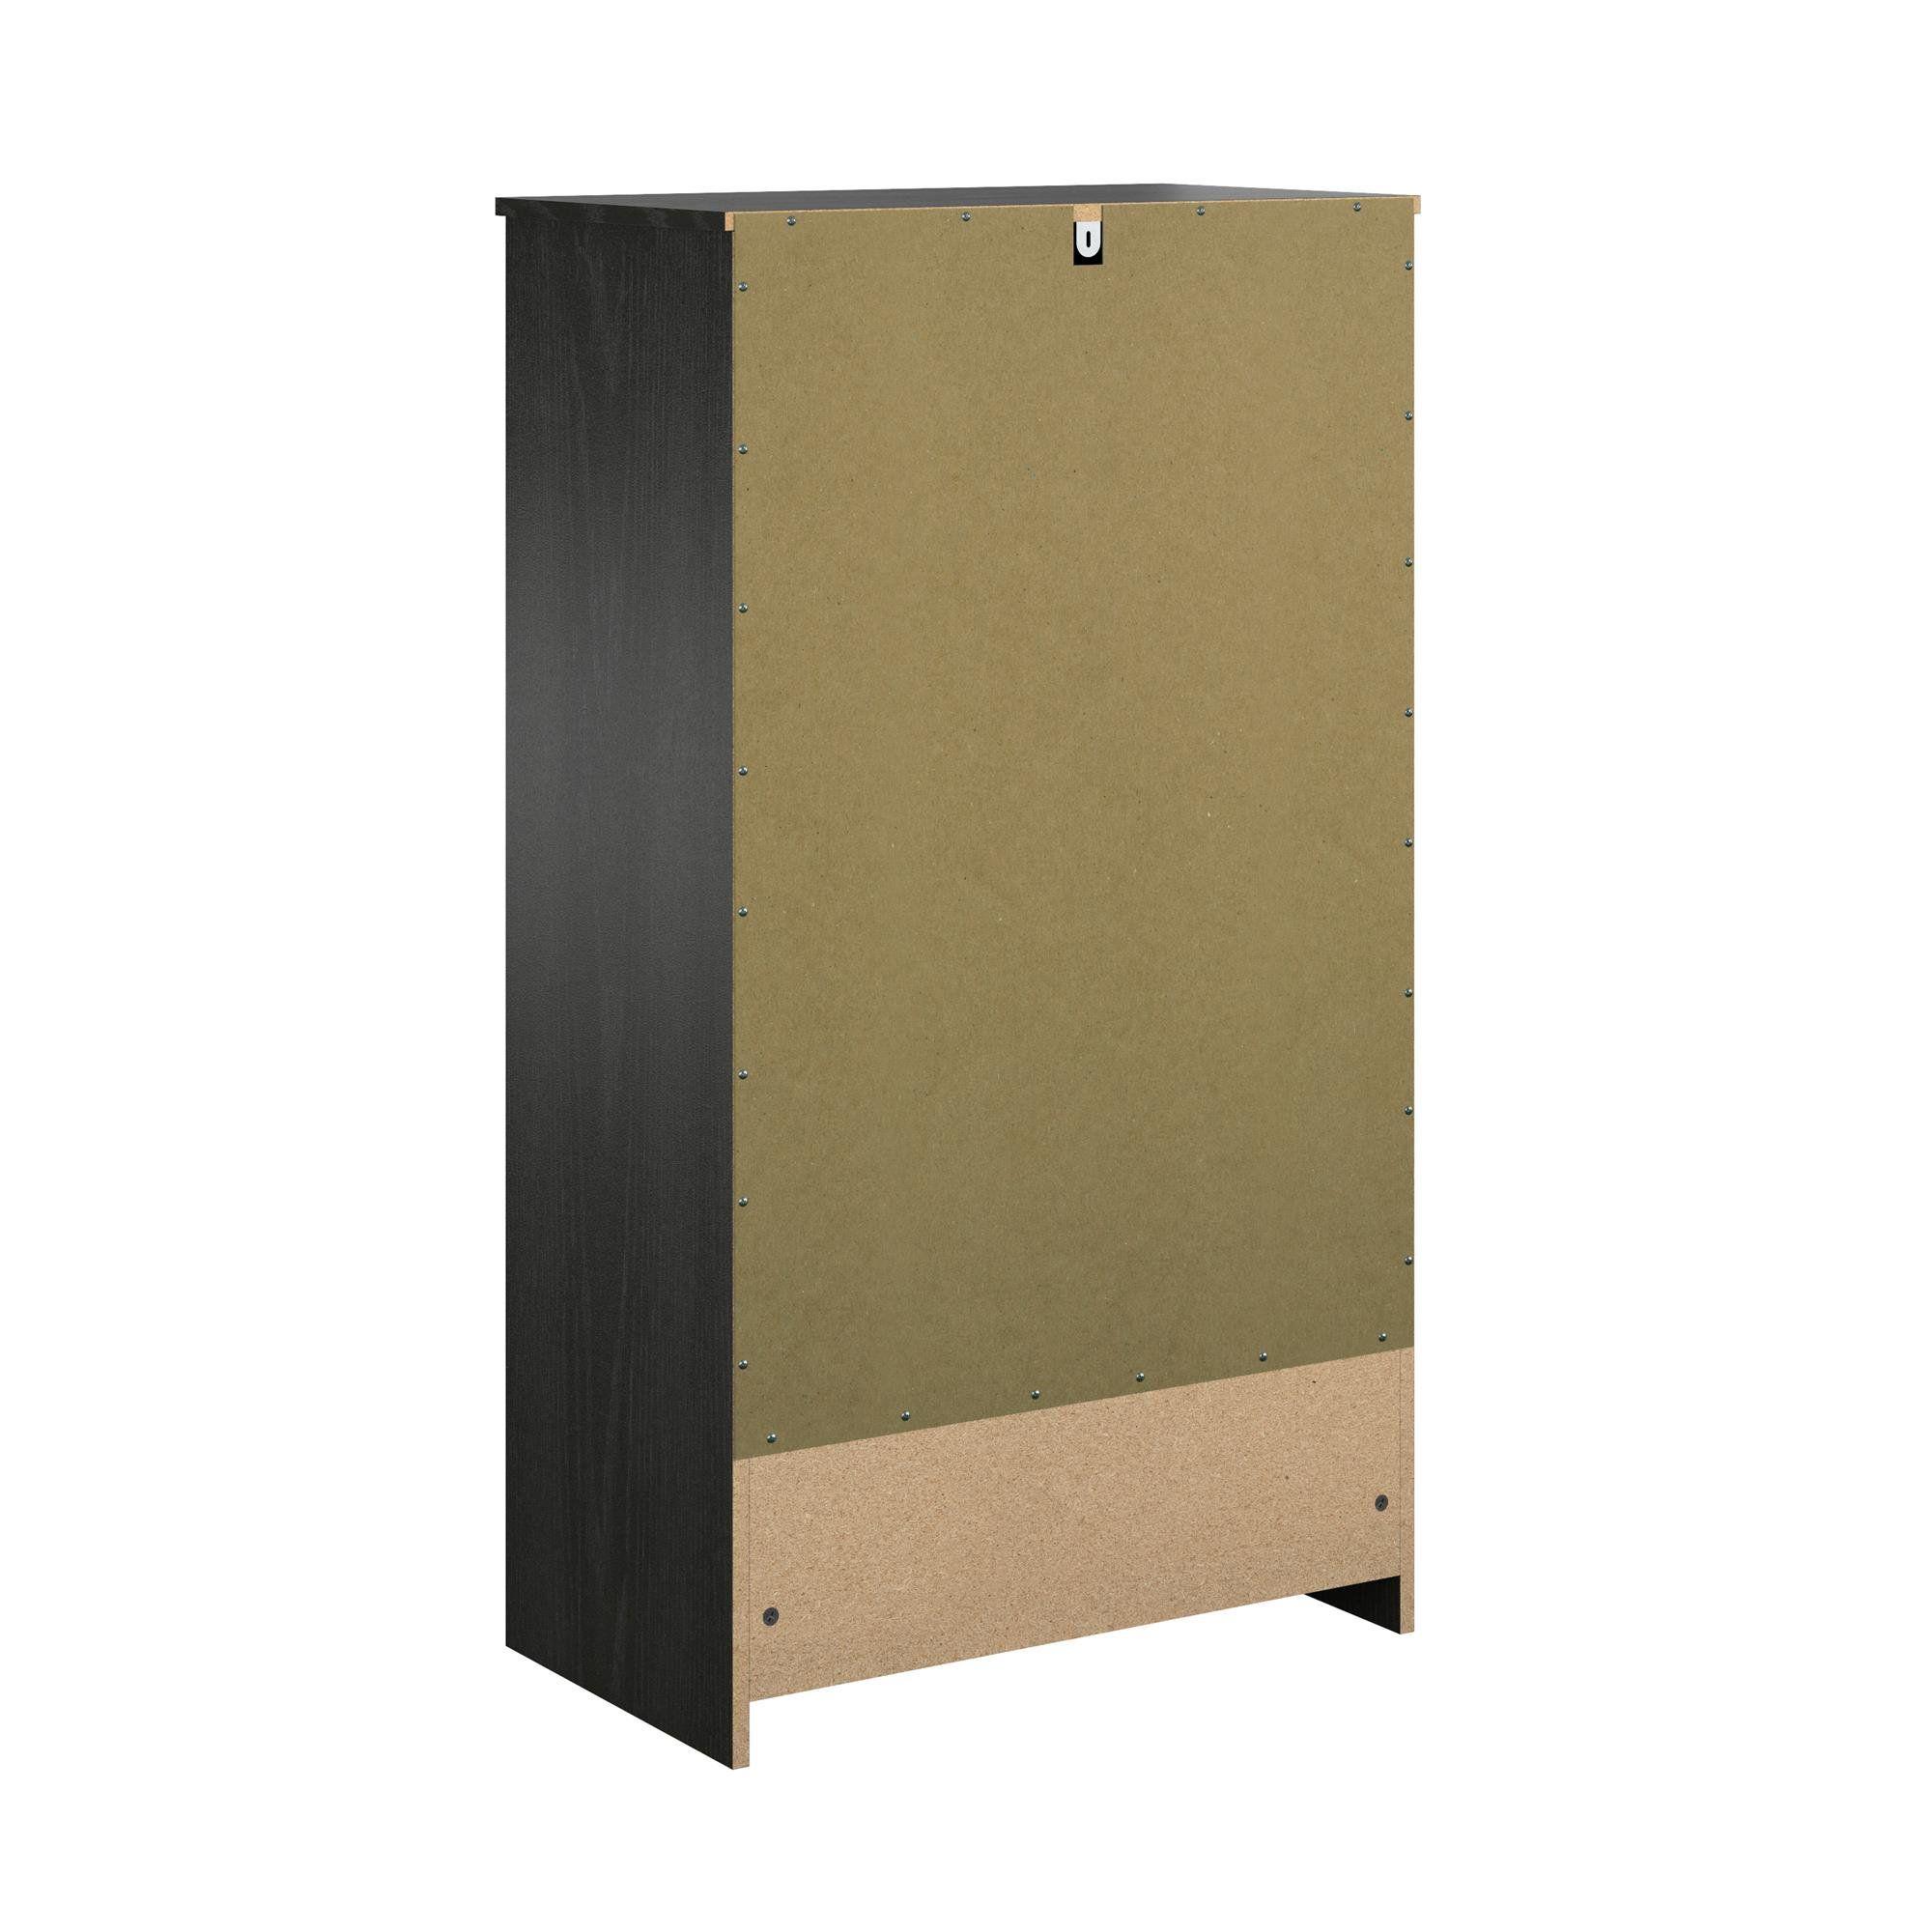 Mainstays Classic 5 Drawer Dresser Black Oak Finish Walmart Com 5 Drawer Dresser Dresser Drawers Tall Dresser Decor [ 2000 x 2000 Pixel ]